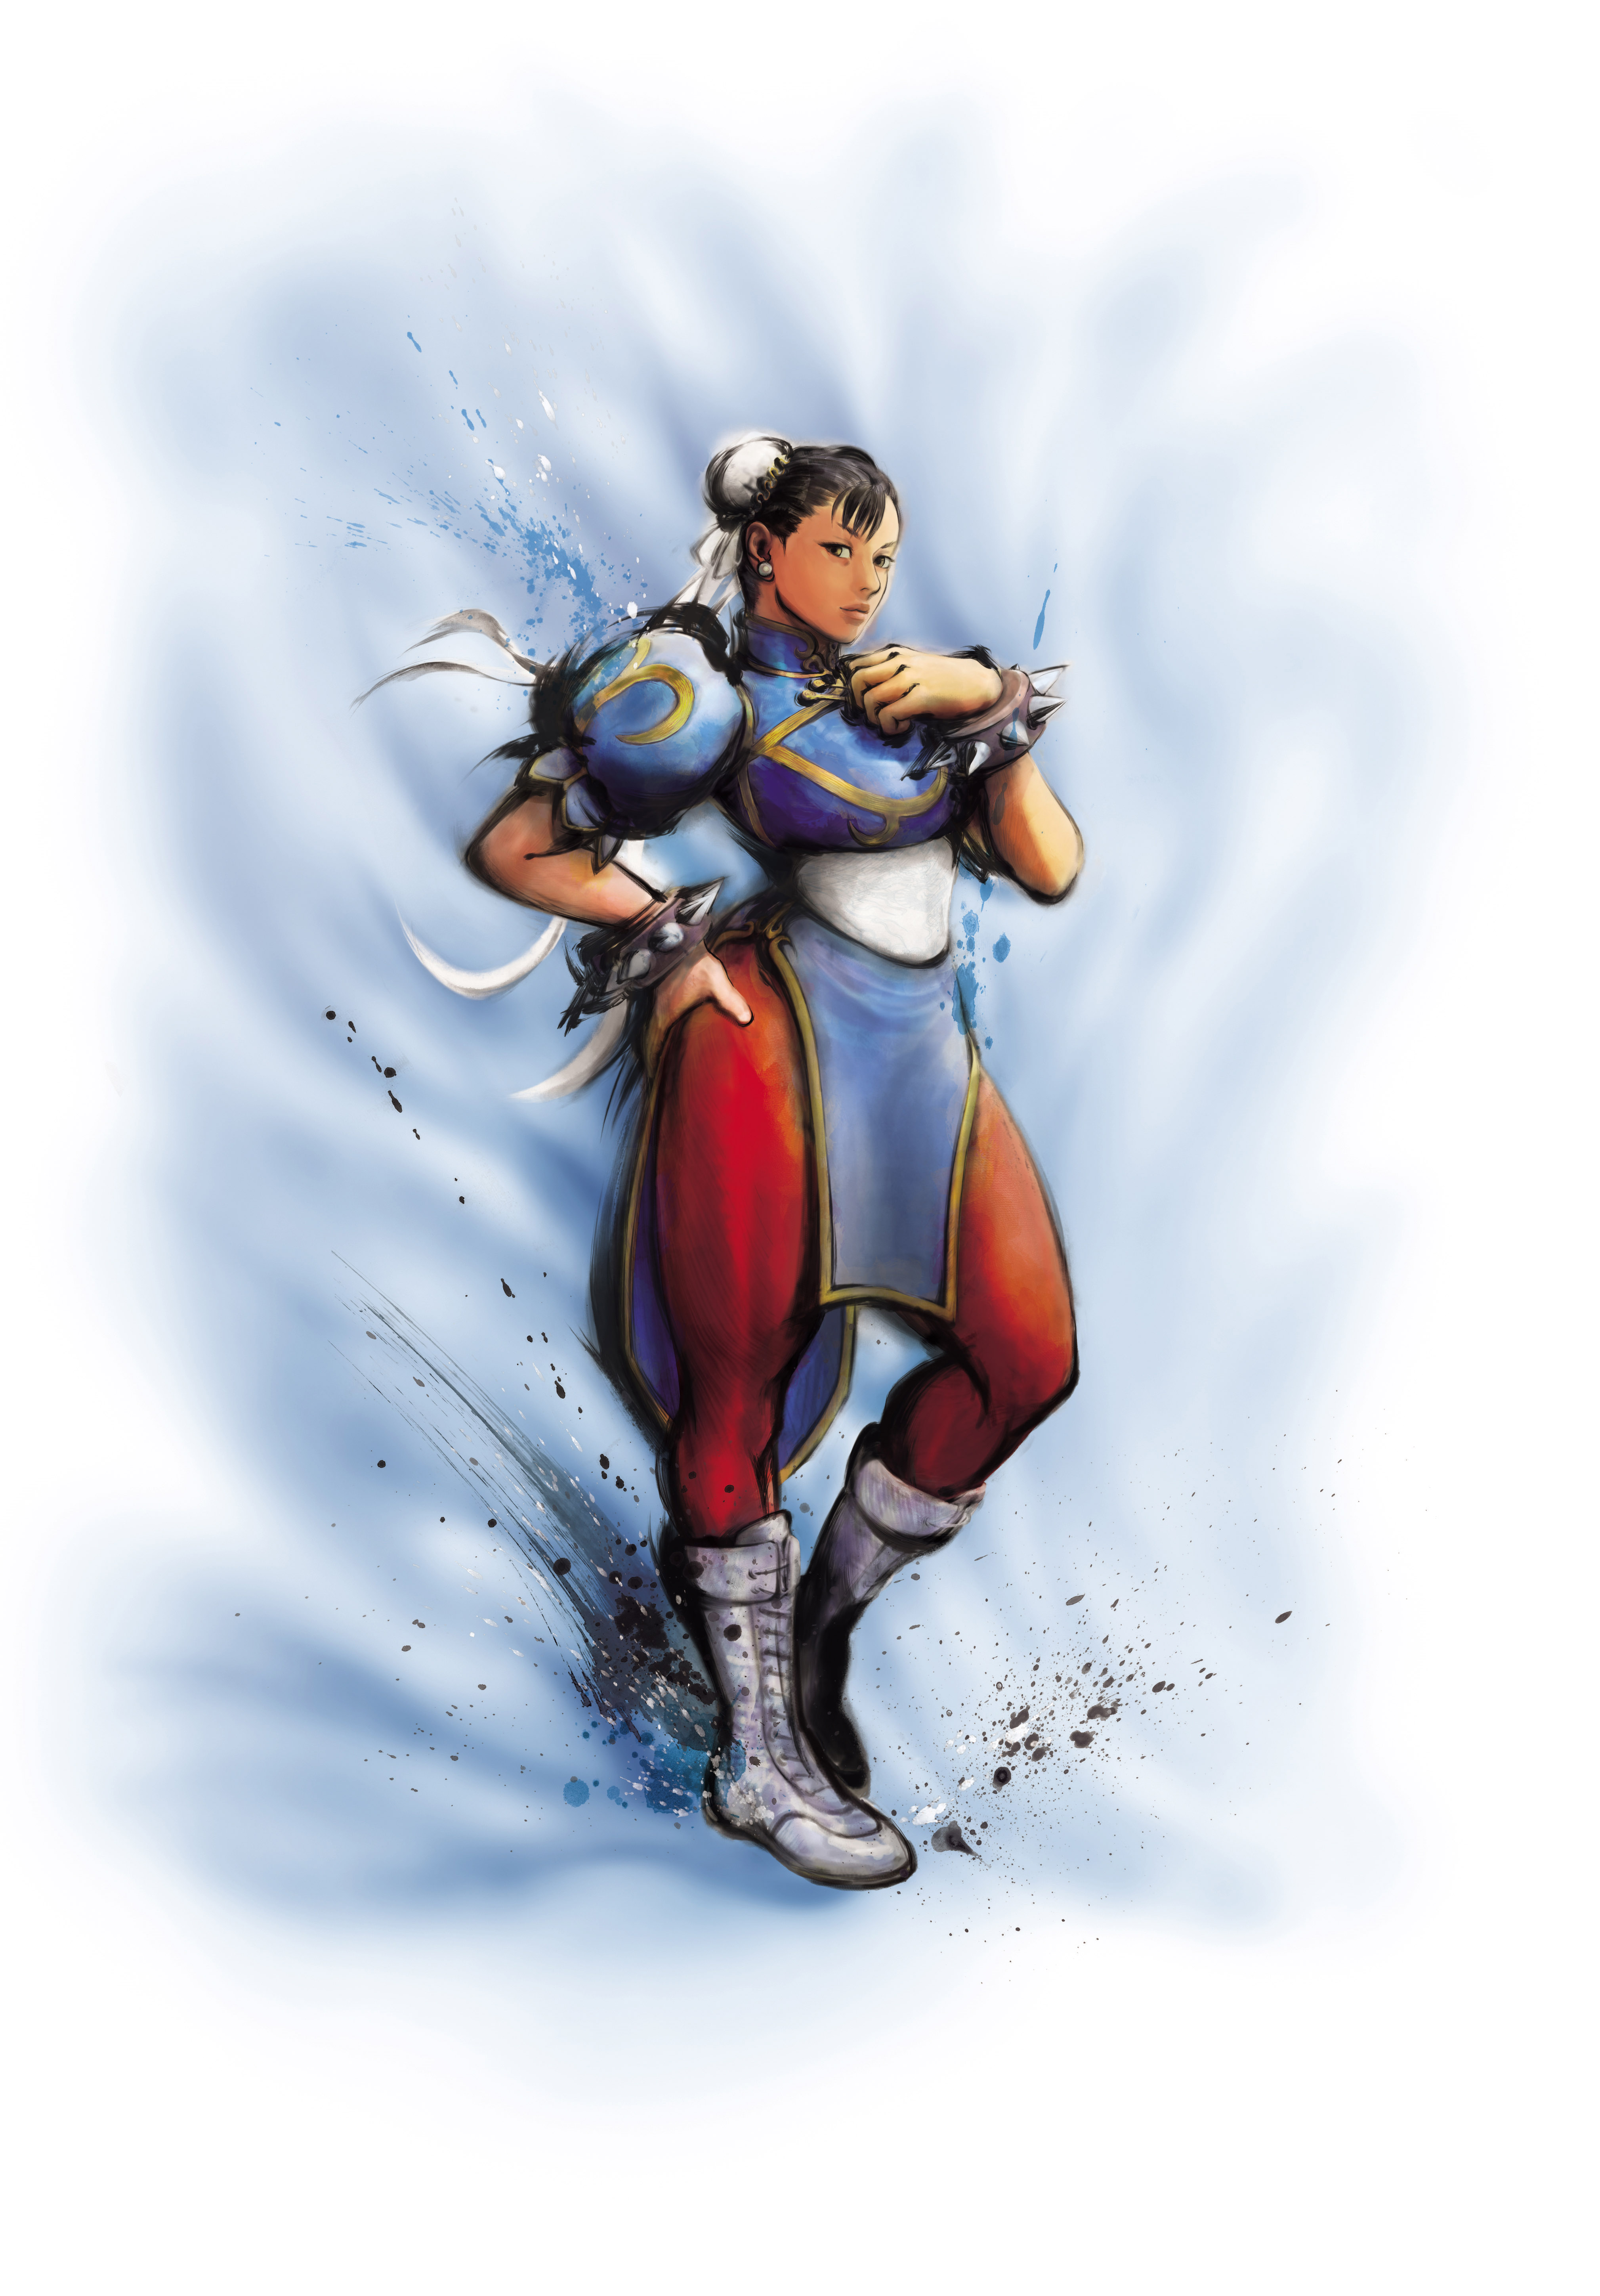 Image - Chun Li MvsC3-FTW.png   Street Fighter Wiki   FANDOM powered by Wikia